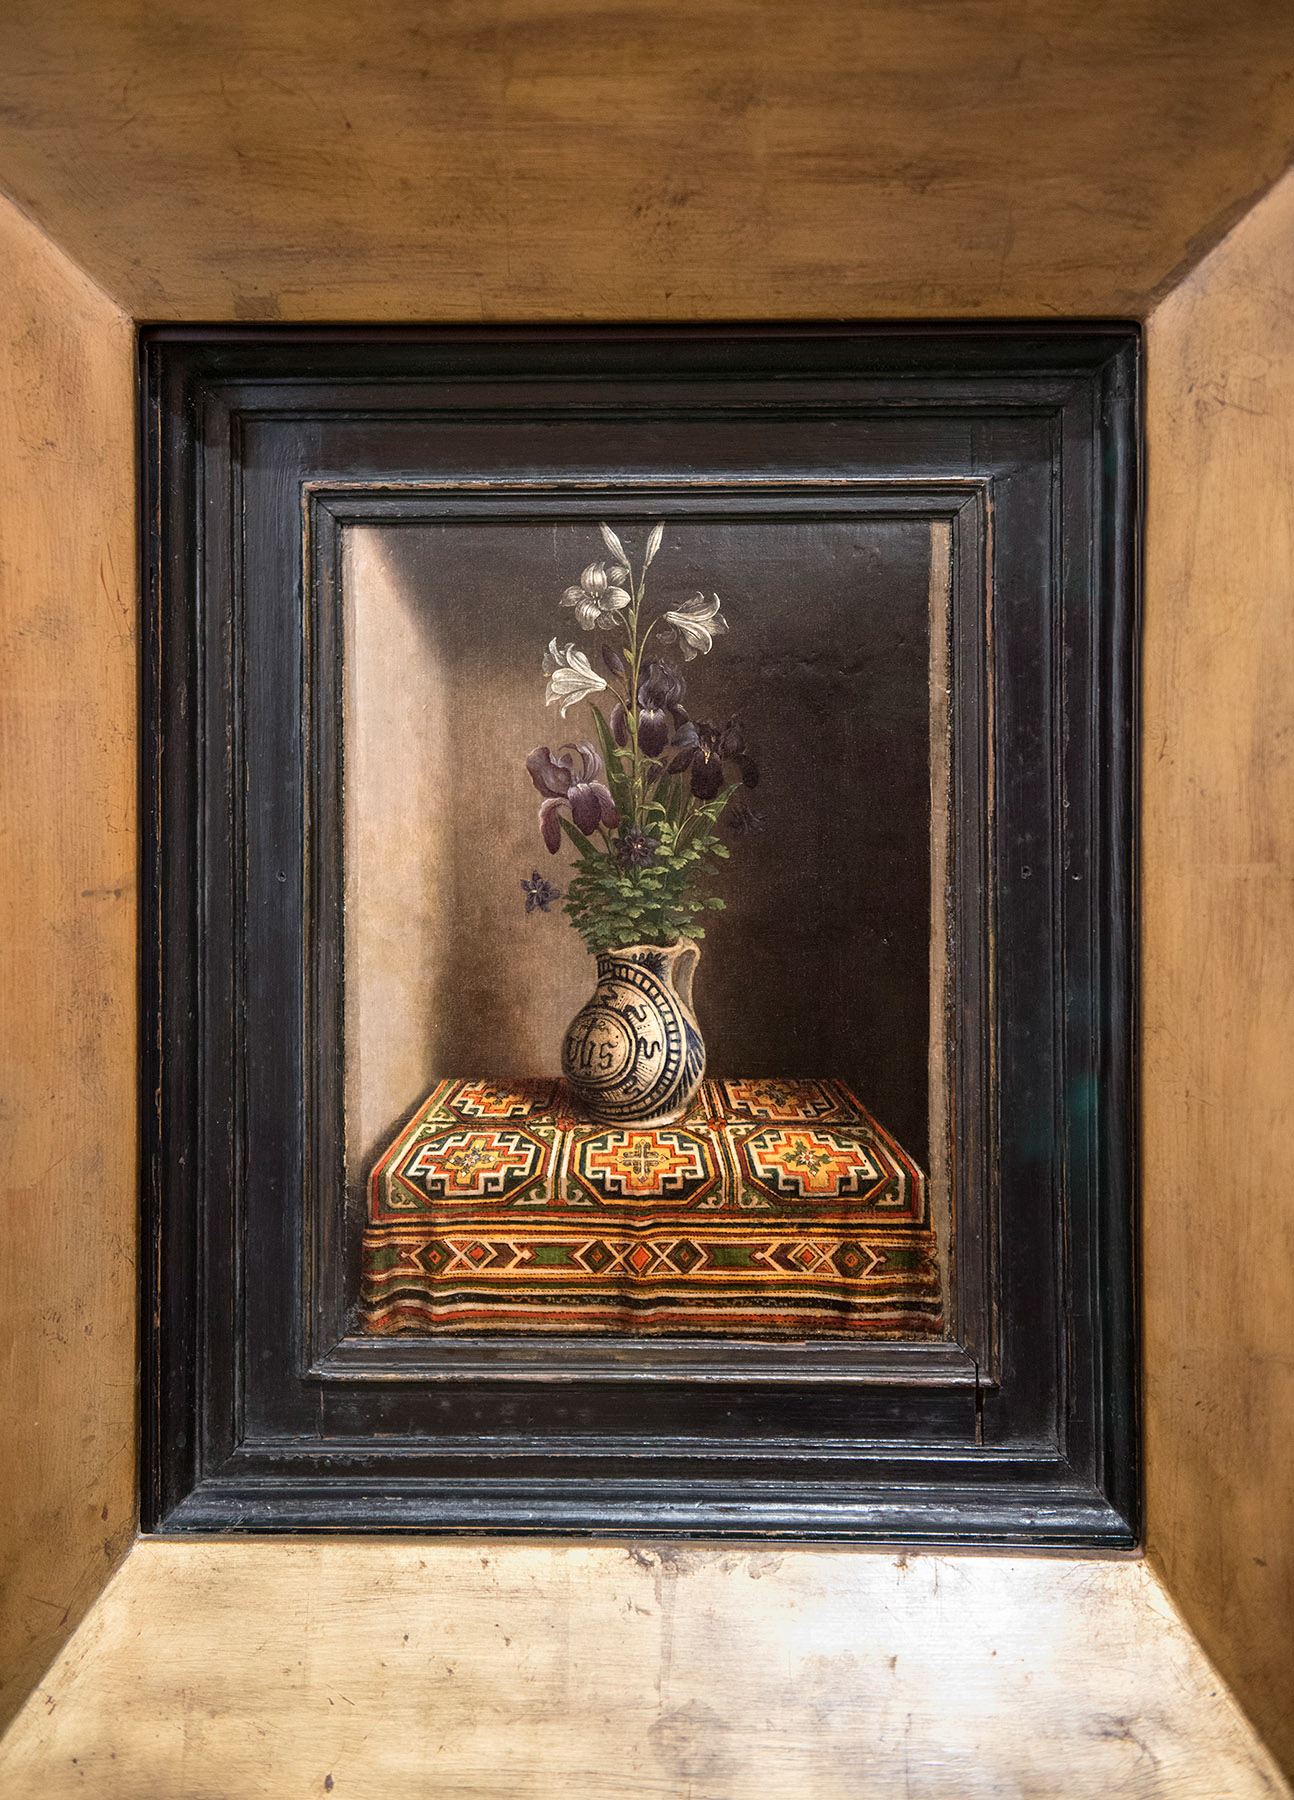 Hans-Memling-1435-1494-Flamlansk-malare